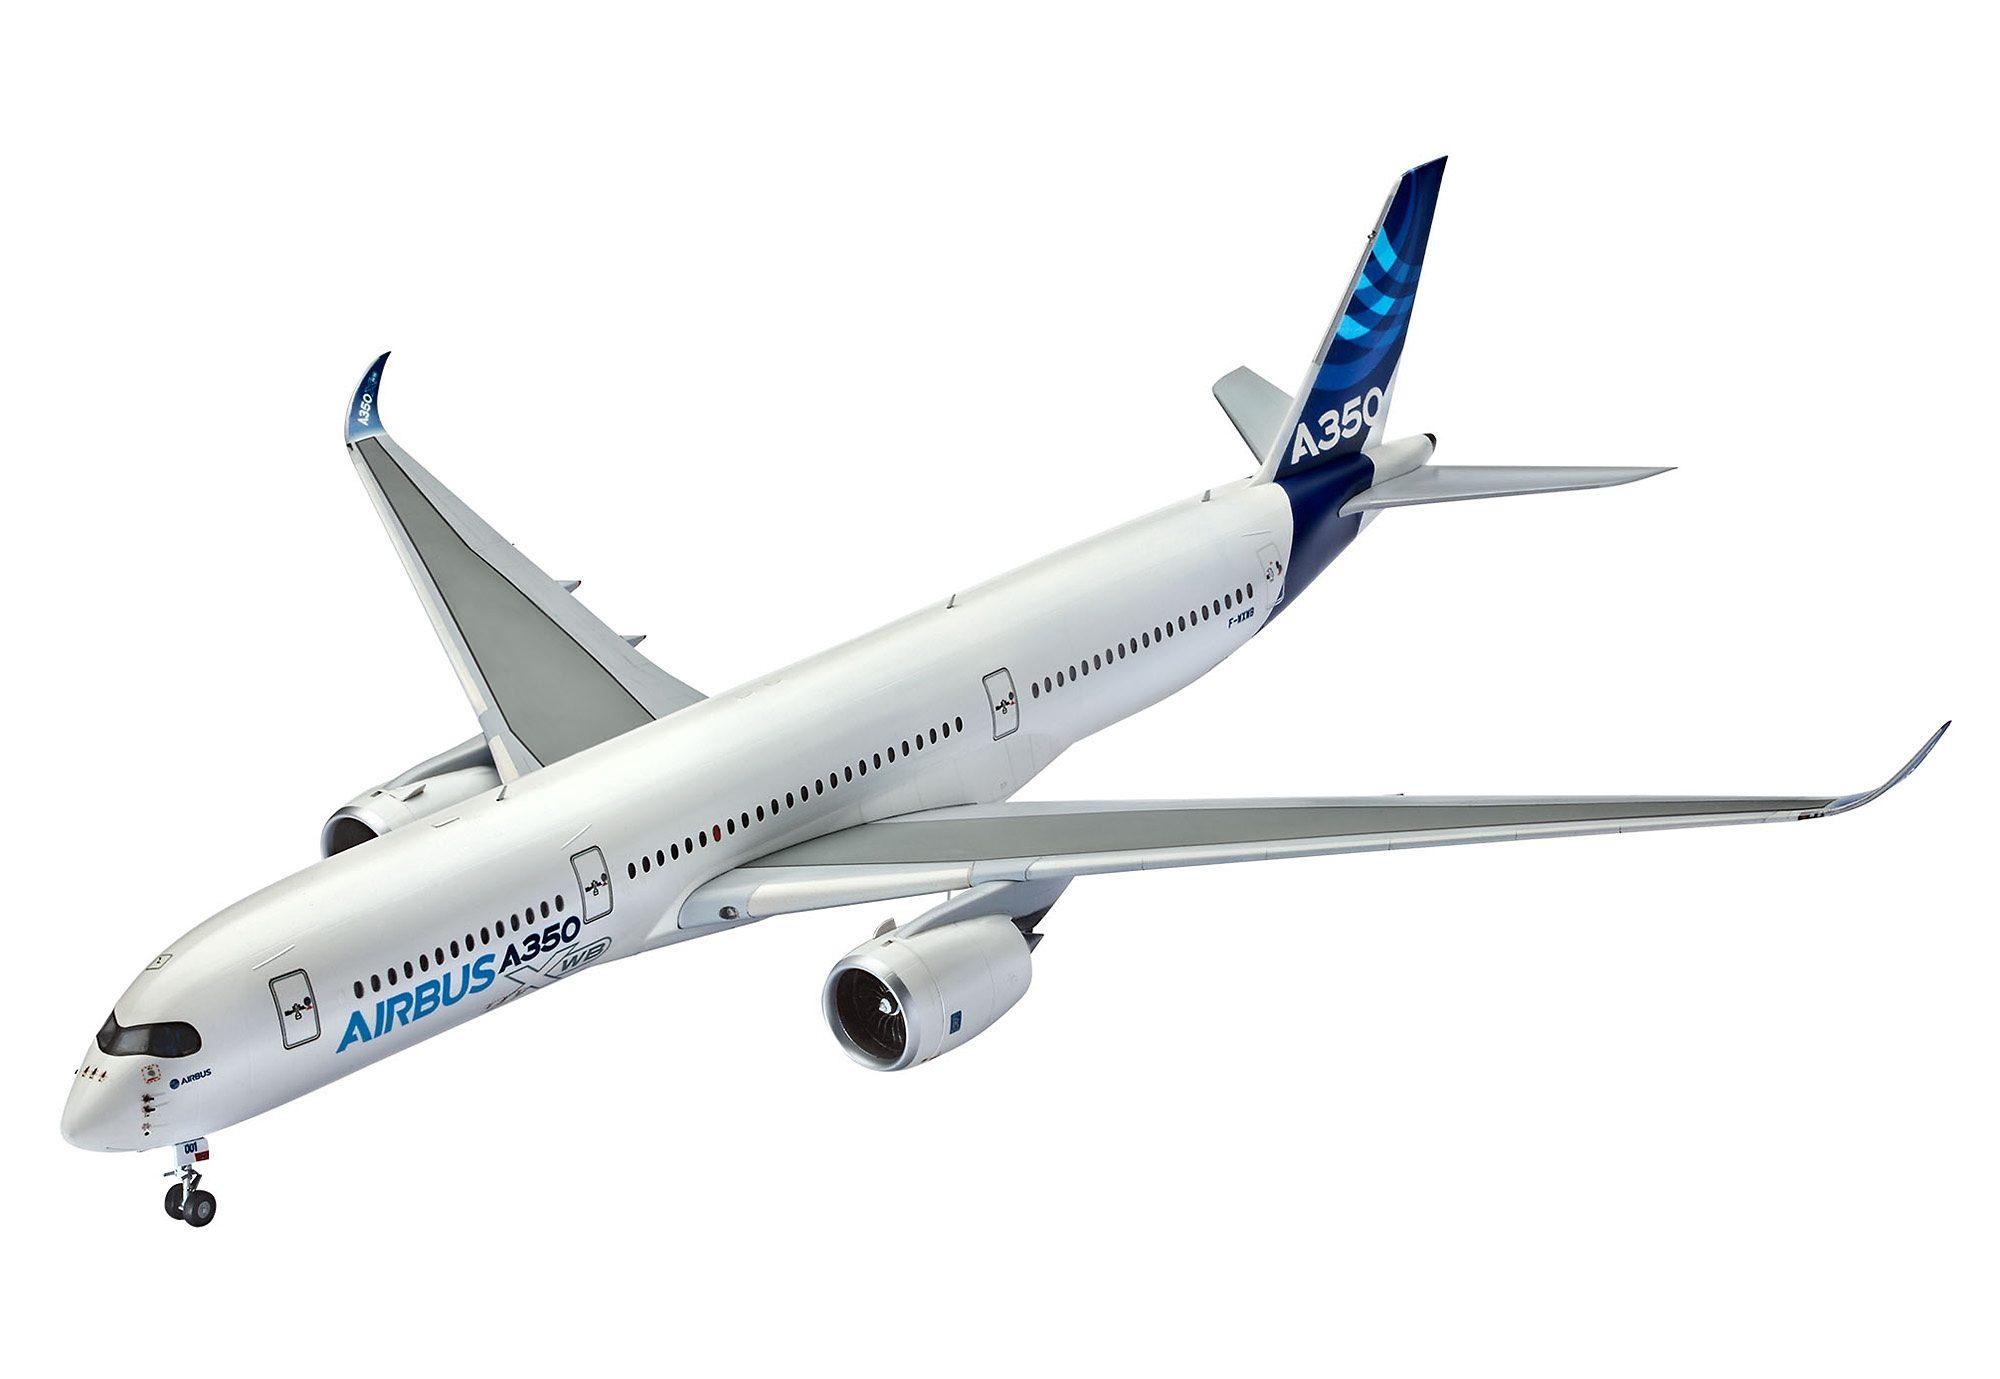 Revell® Modellbausatz Flugzeug, »Airbus A350-900«, Maßstab 1:144